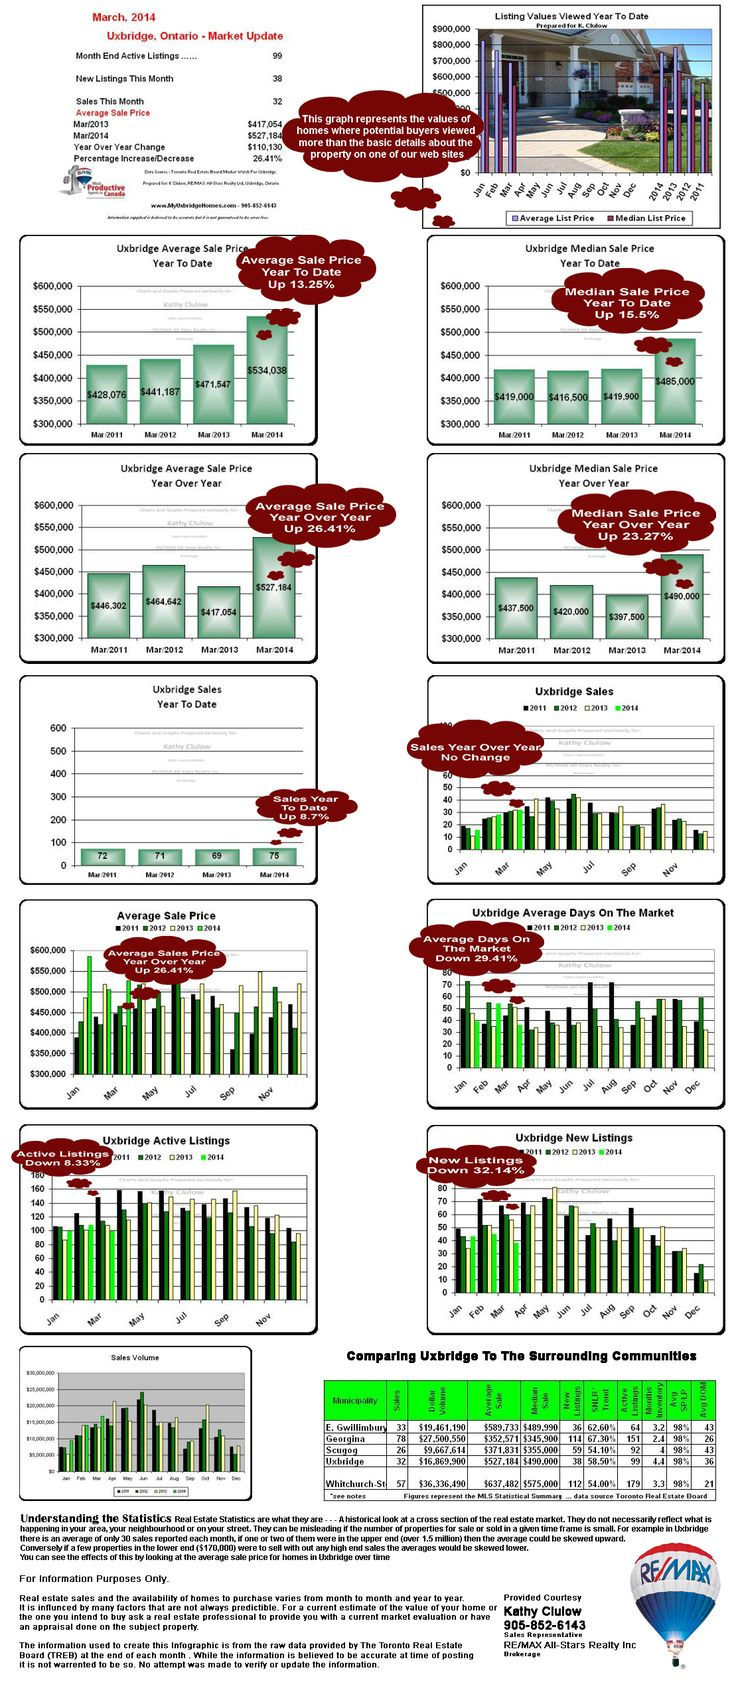 March 2014 Uxbridge Real Estate Market Update by  #KathyClulow 905.852.6143 www.KathyClulow.ca